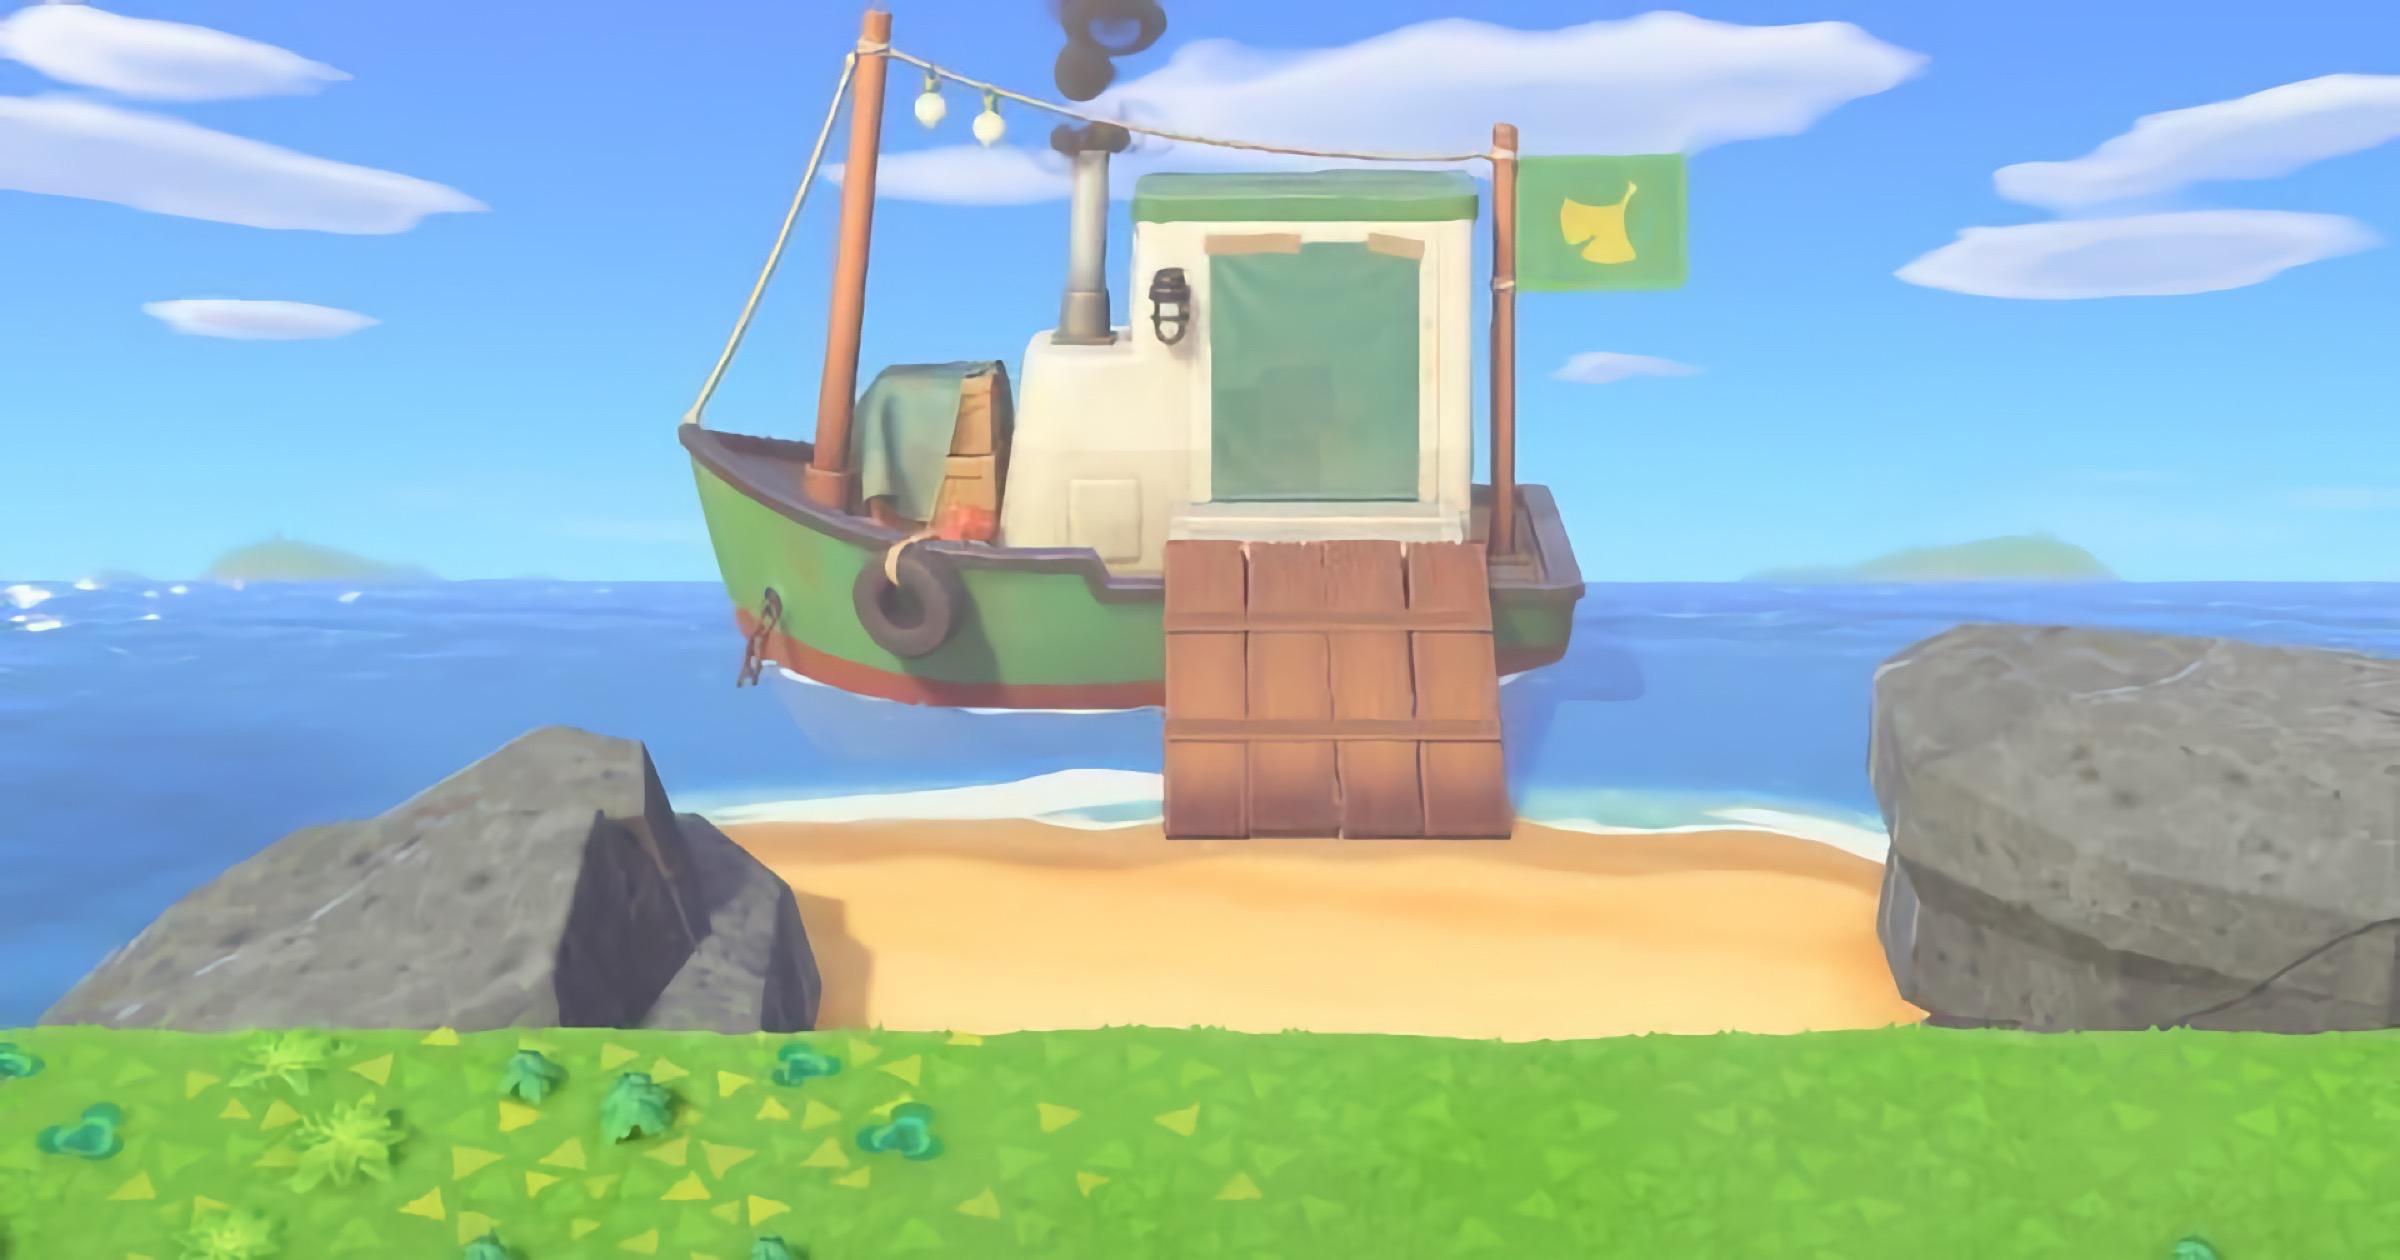 Jolly redd's treasure trawler